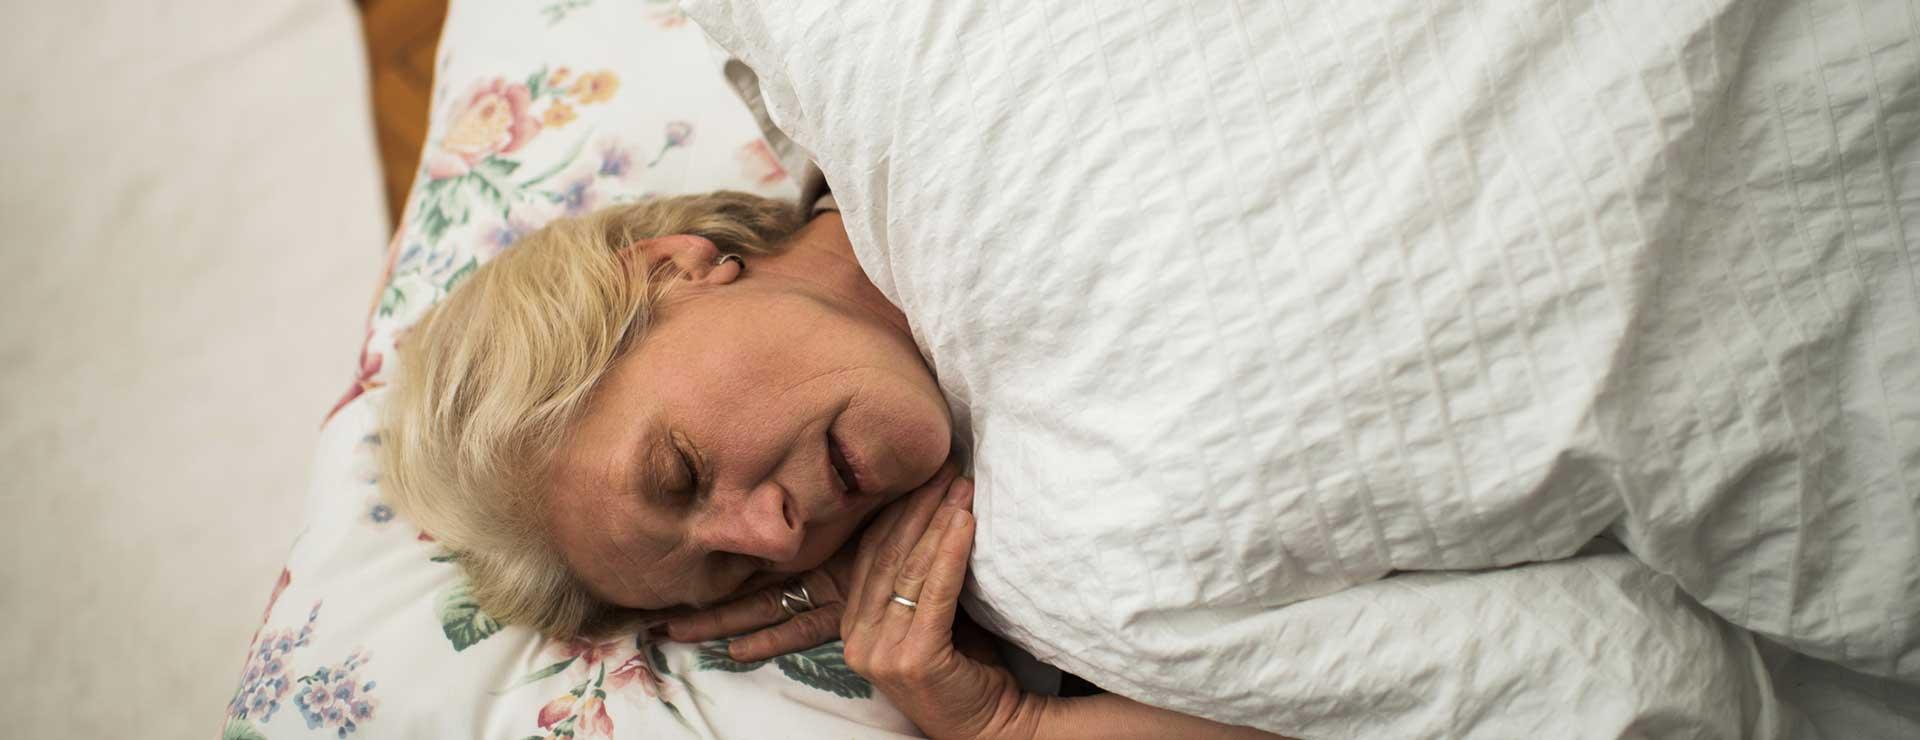 Treating coronavirus takes a toll on doctors' and nurses' mental ...